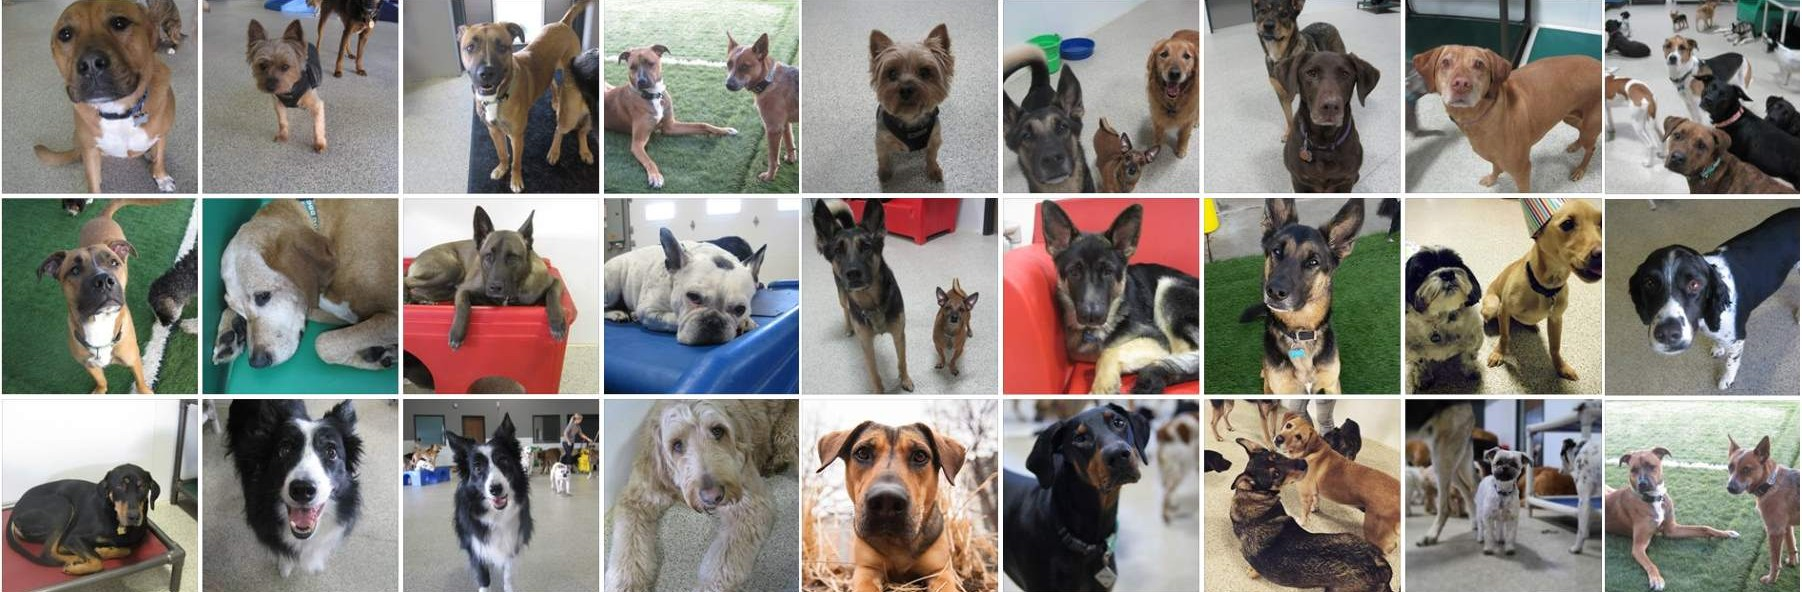 Doggie-Daycare